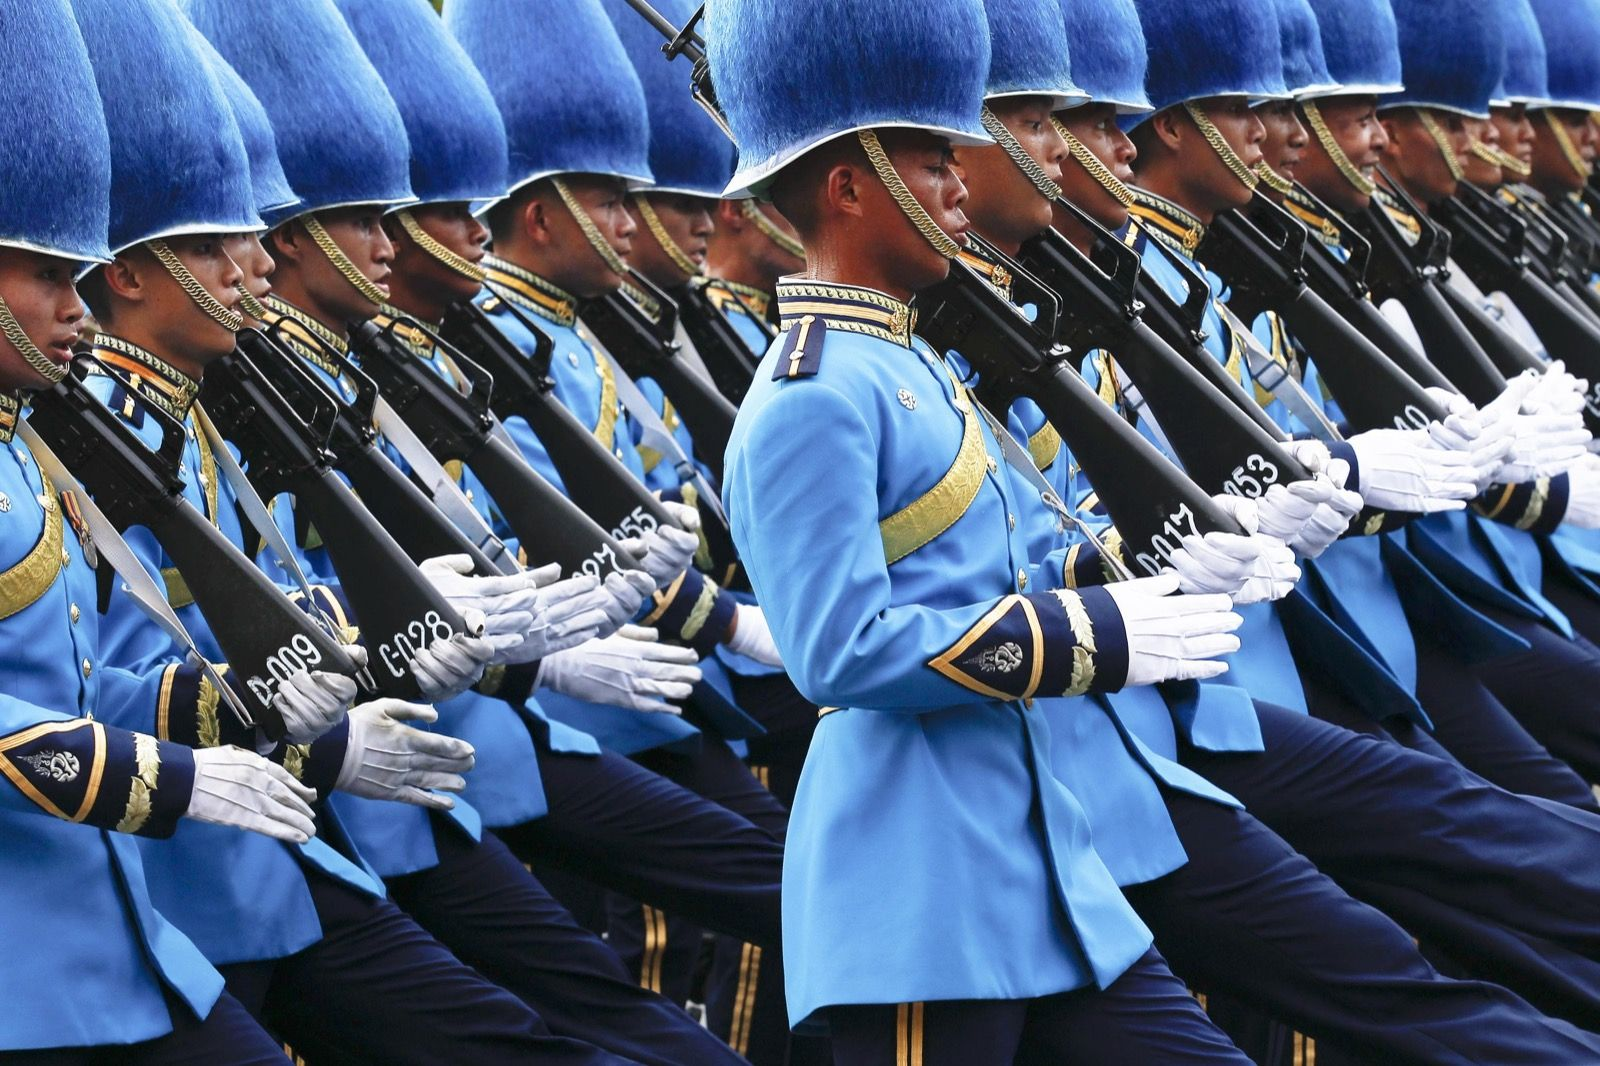 La Guardia Reale marcia davanti al Grand Palace durante una parata militare a Bangkok. REUTERS / Chaiwat Subprasom